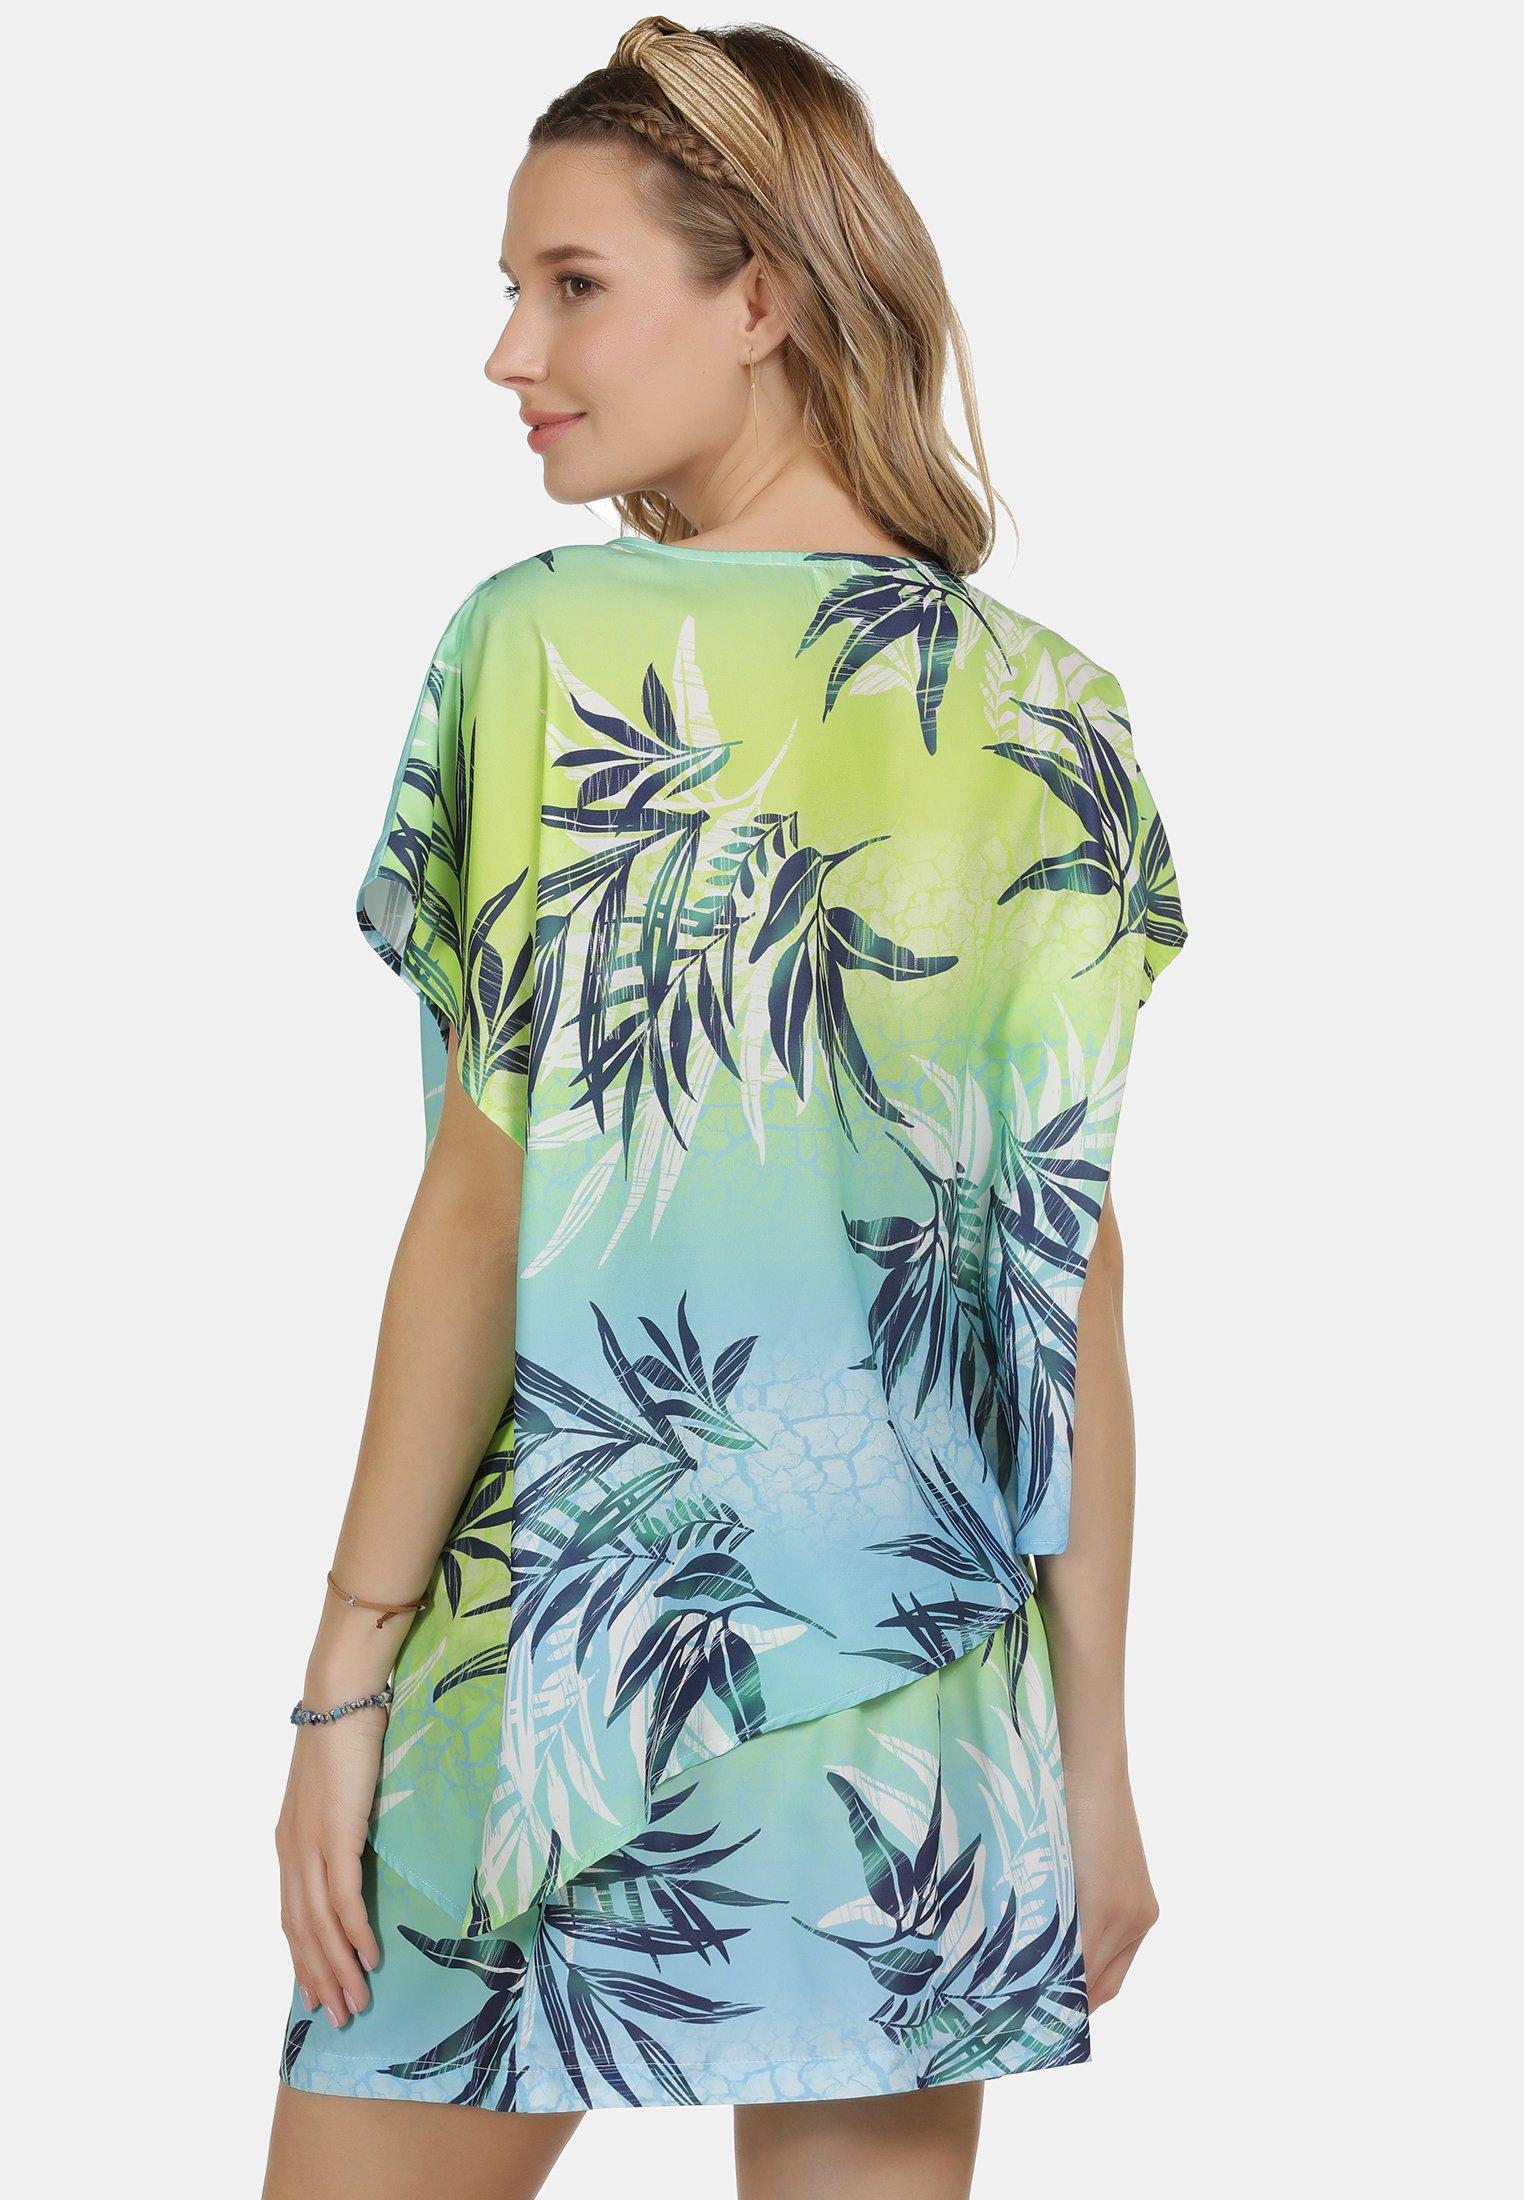 IZIA IZIA PRINT-SHIRT - T-shirt imprimé - tropical print - Tops & T-shirts Femme 3SLSa